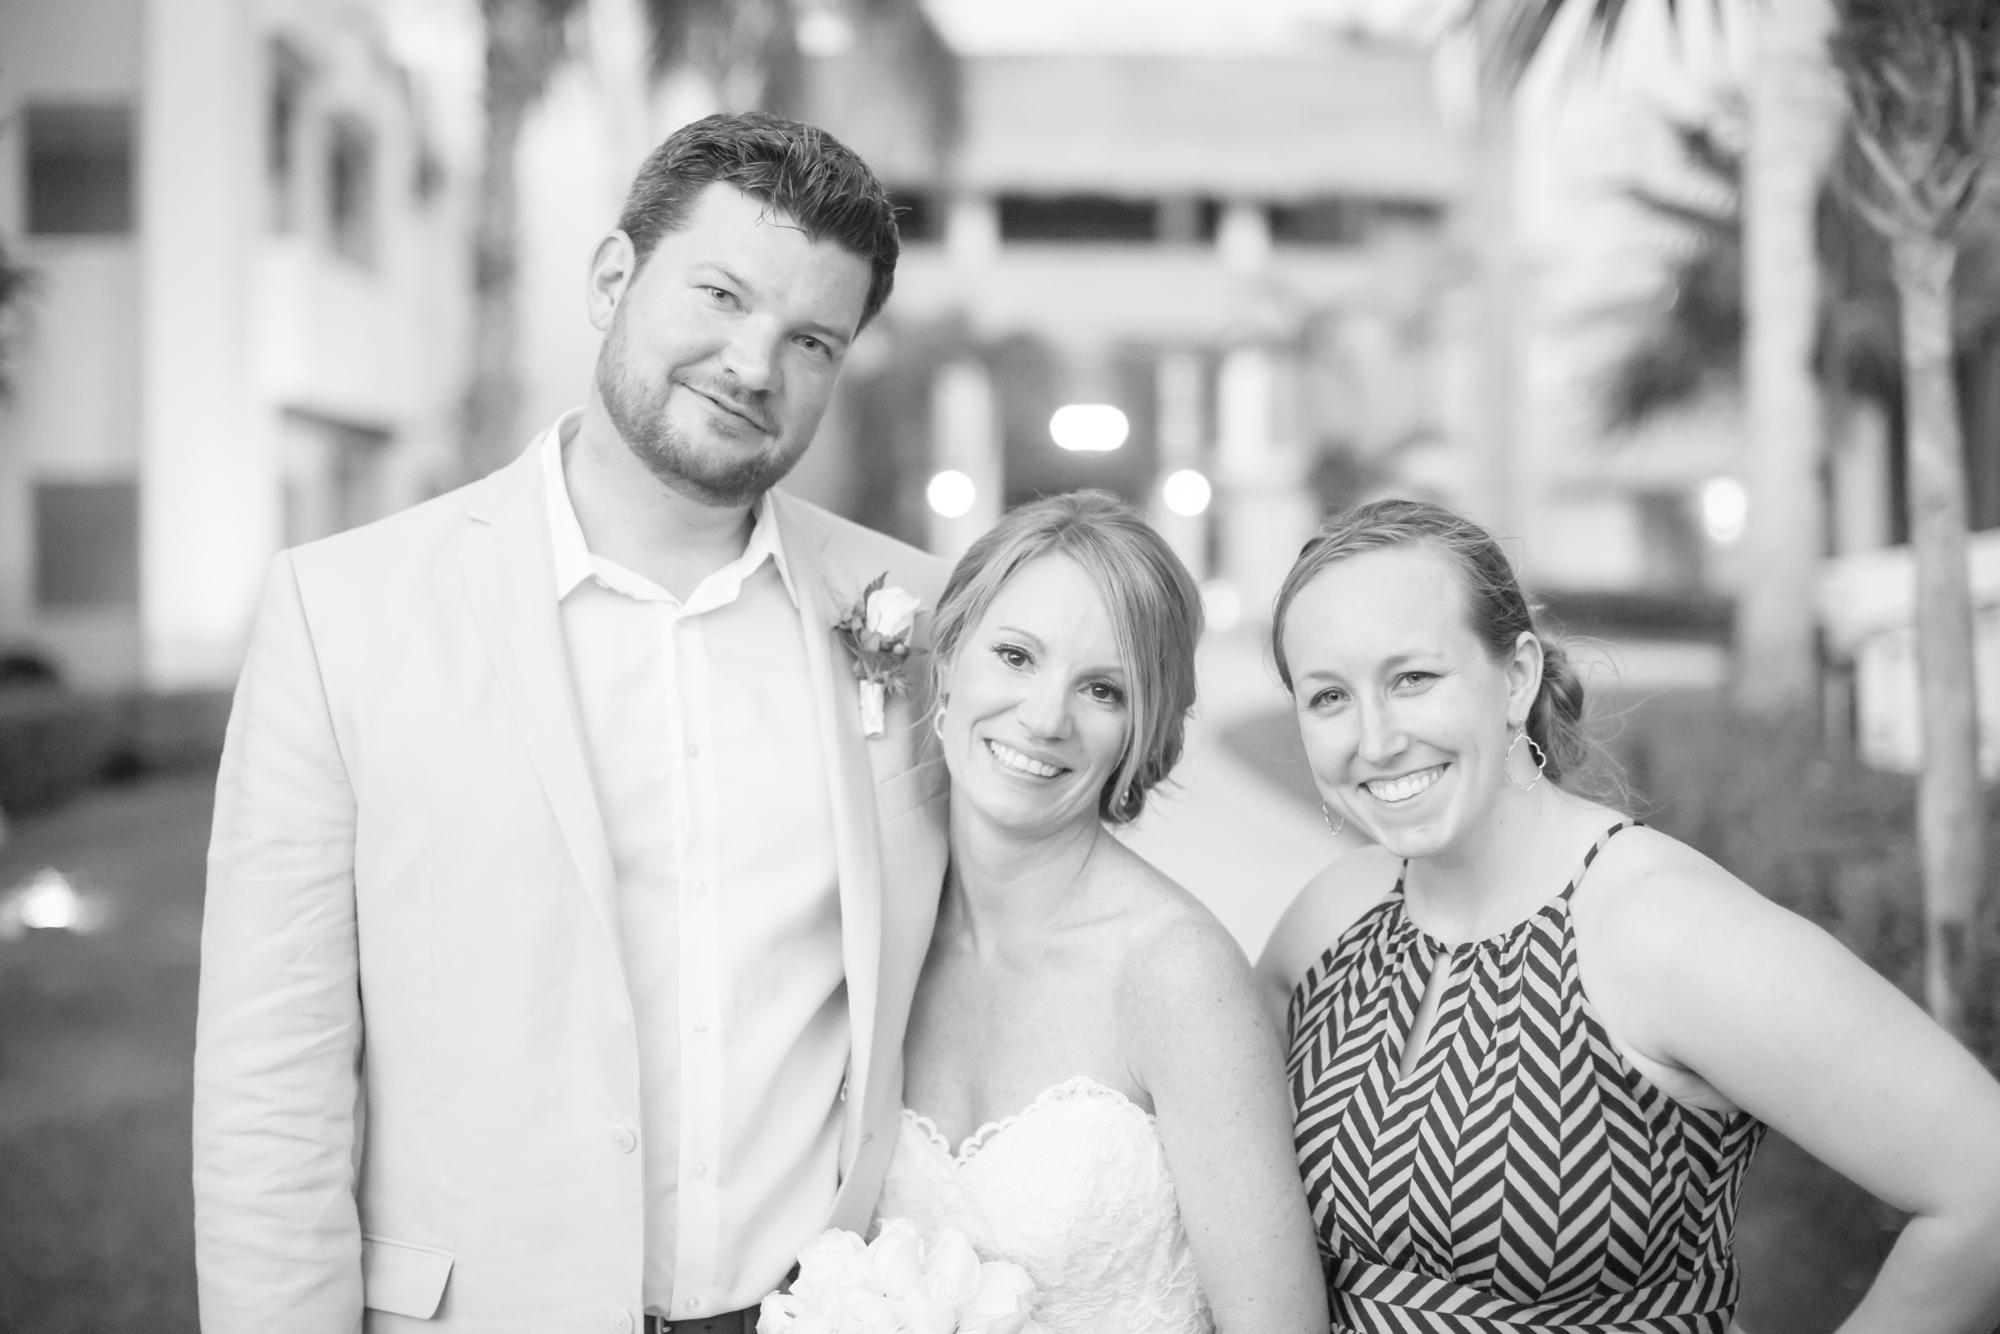 Morosoff Wedding 4-Bride & Groom Portraits-583_anna grace photography destination wedding photographer playa del carmen mexico photo.jpg